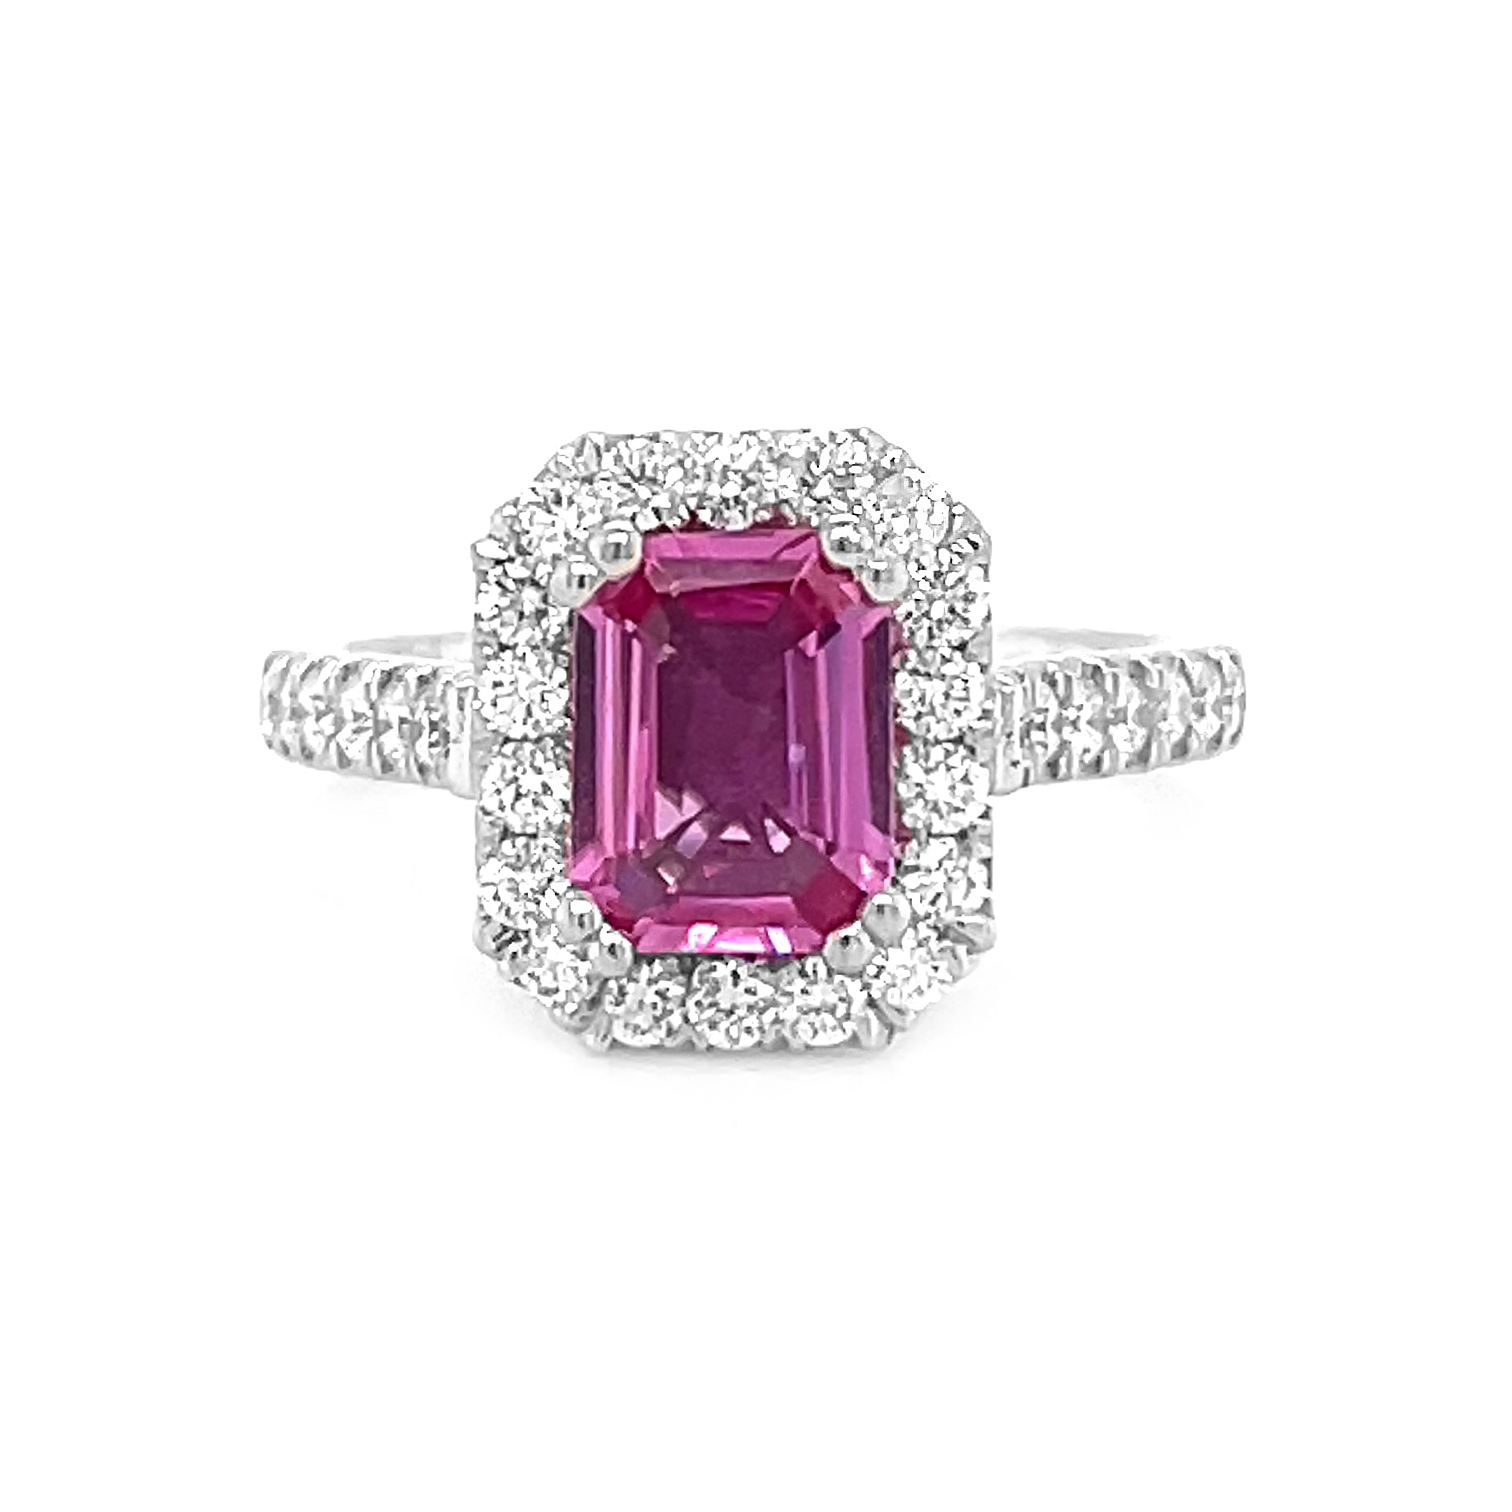 18k White Gold Pink Sapphire & Brilliant Cut Diamond Cluster Ring